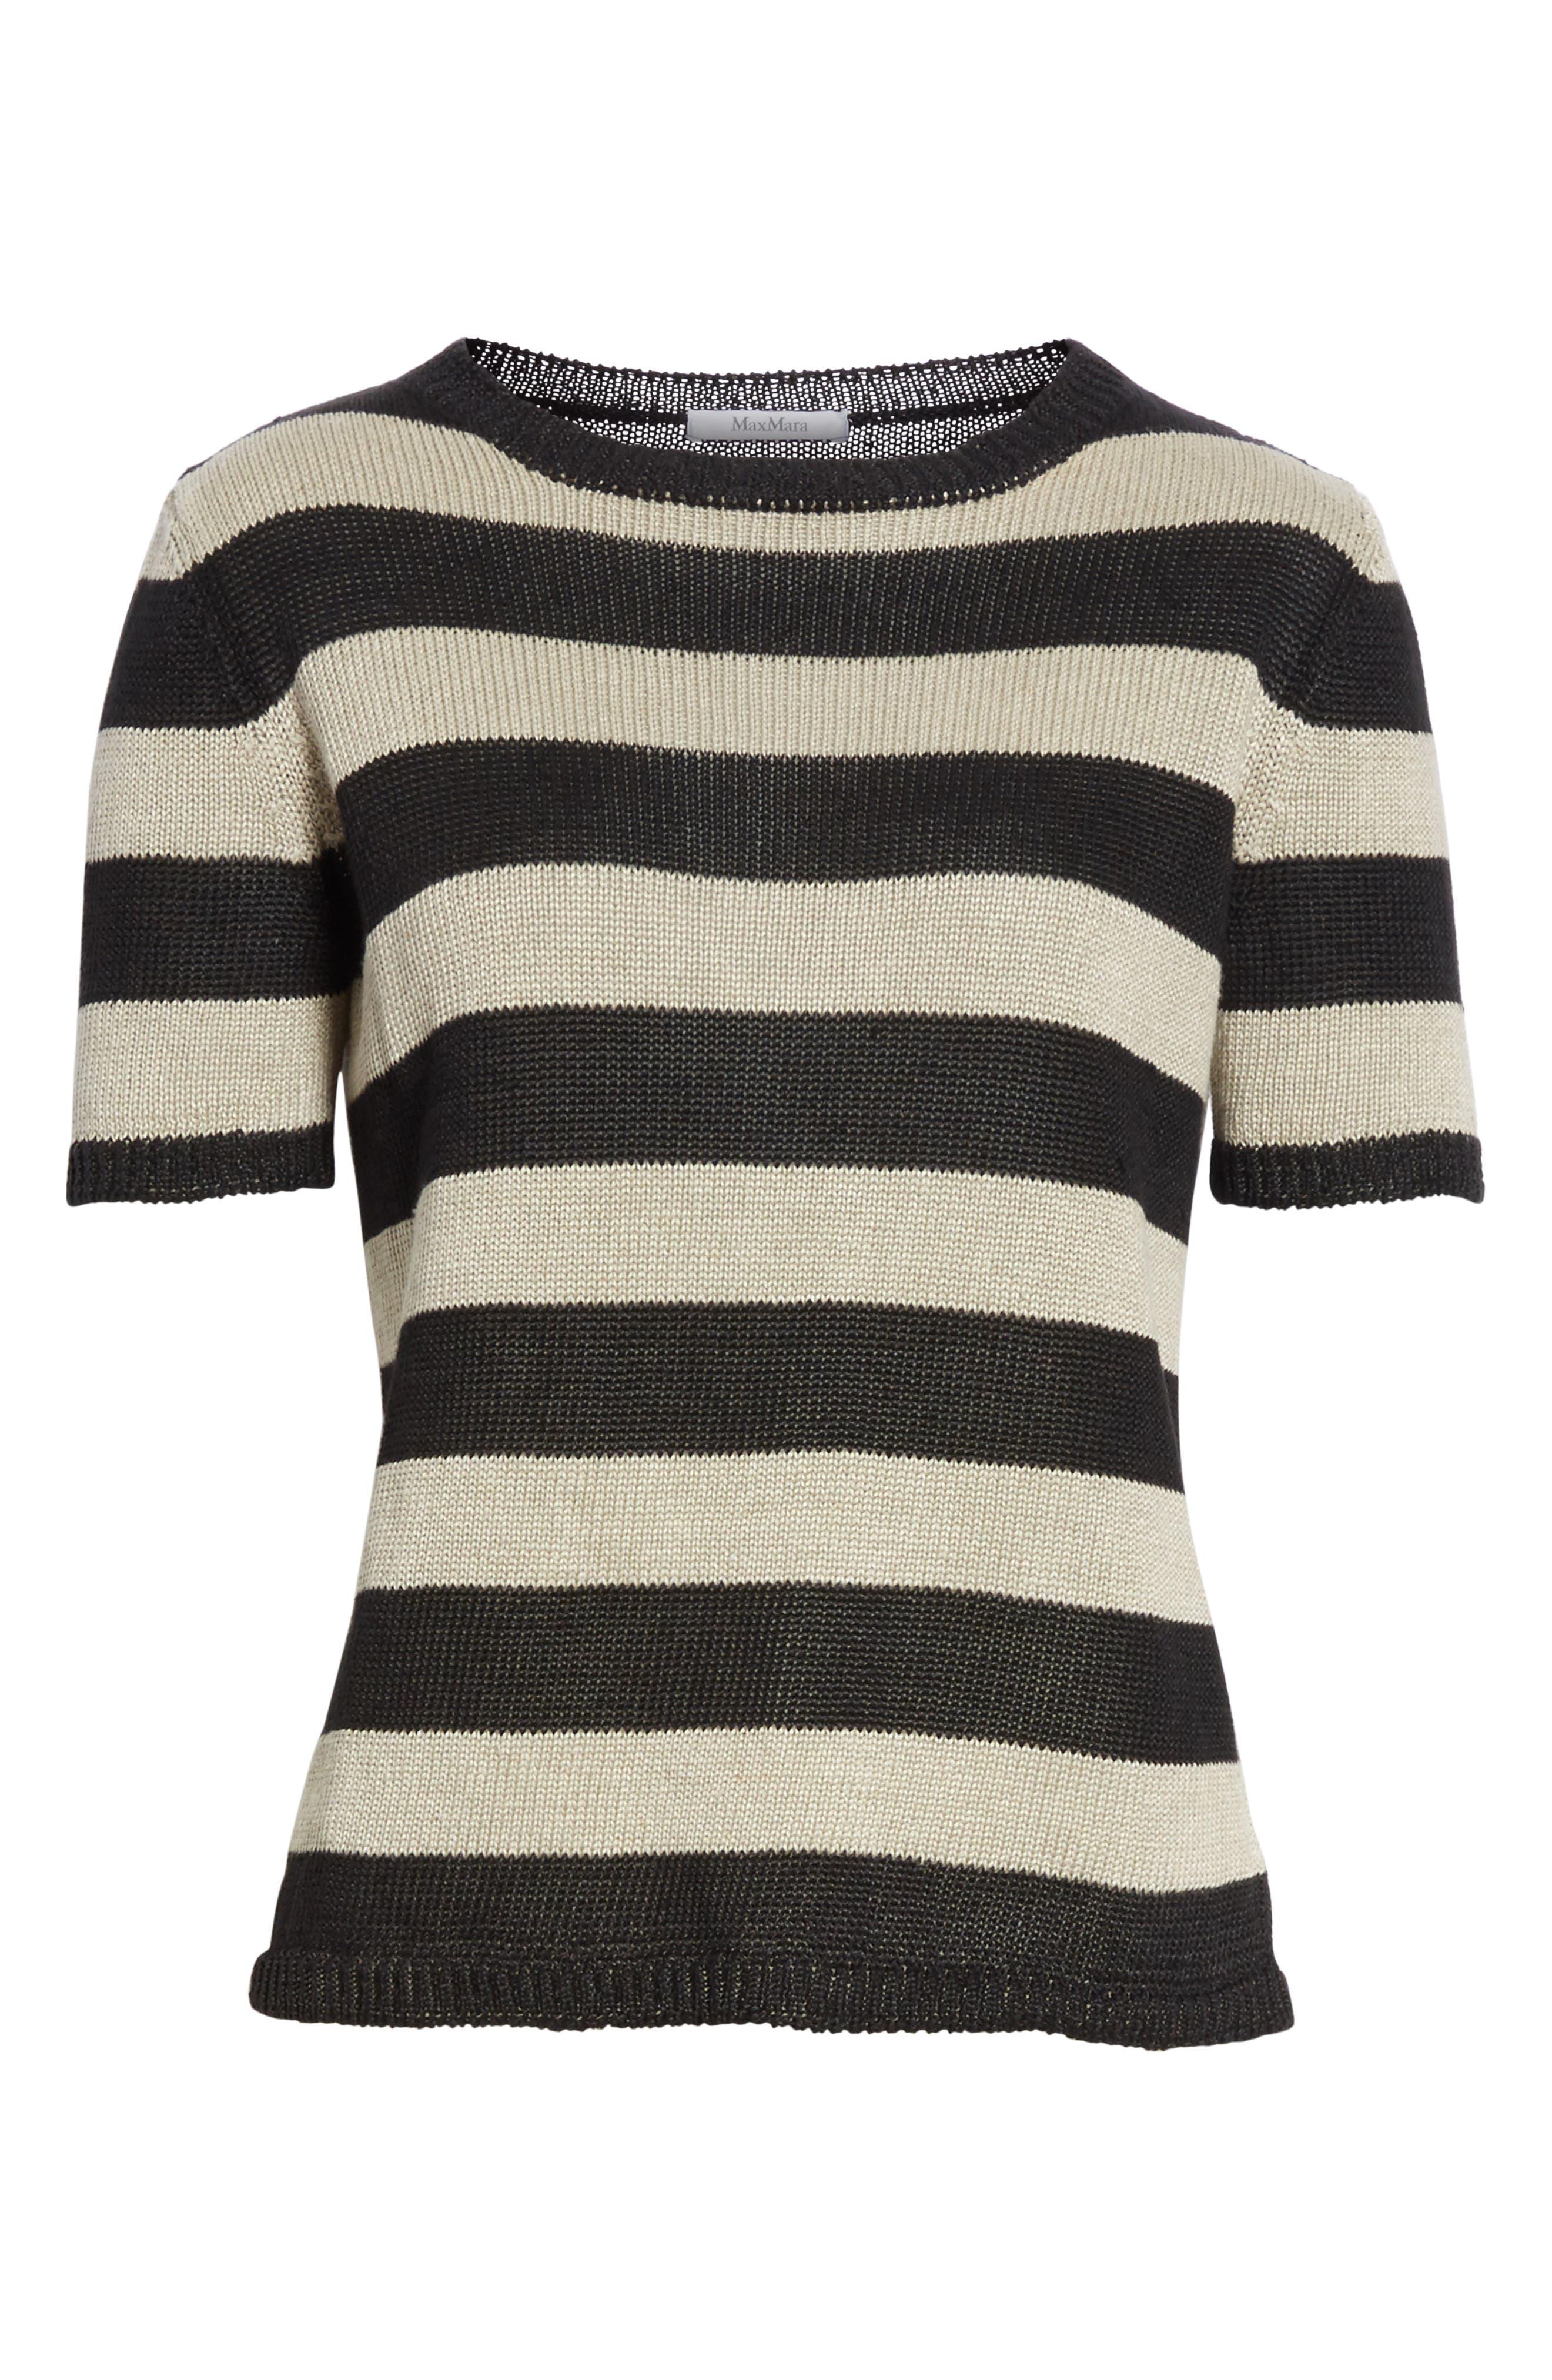 Filly Stripe Linen Sweater,                             Alternate thumbnail 6, color,                             256